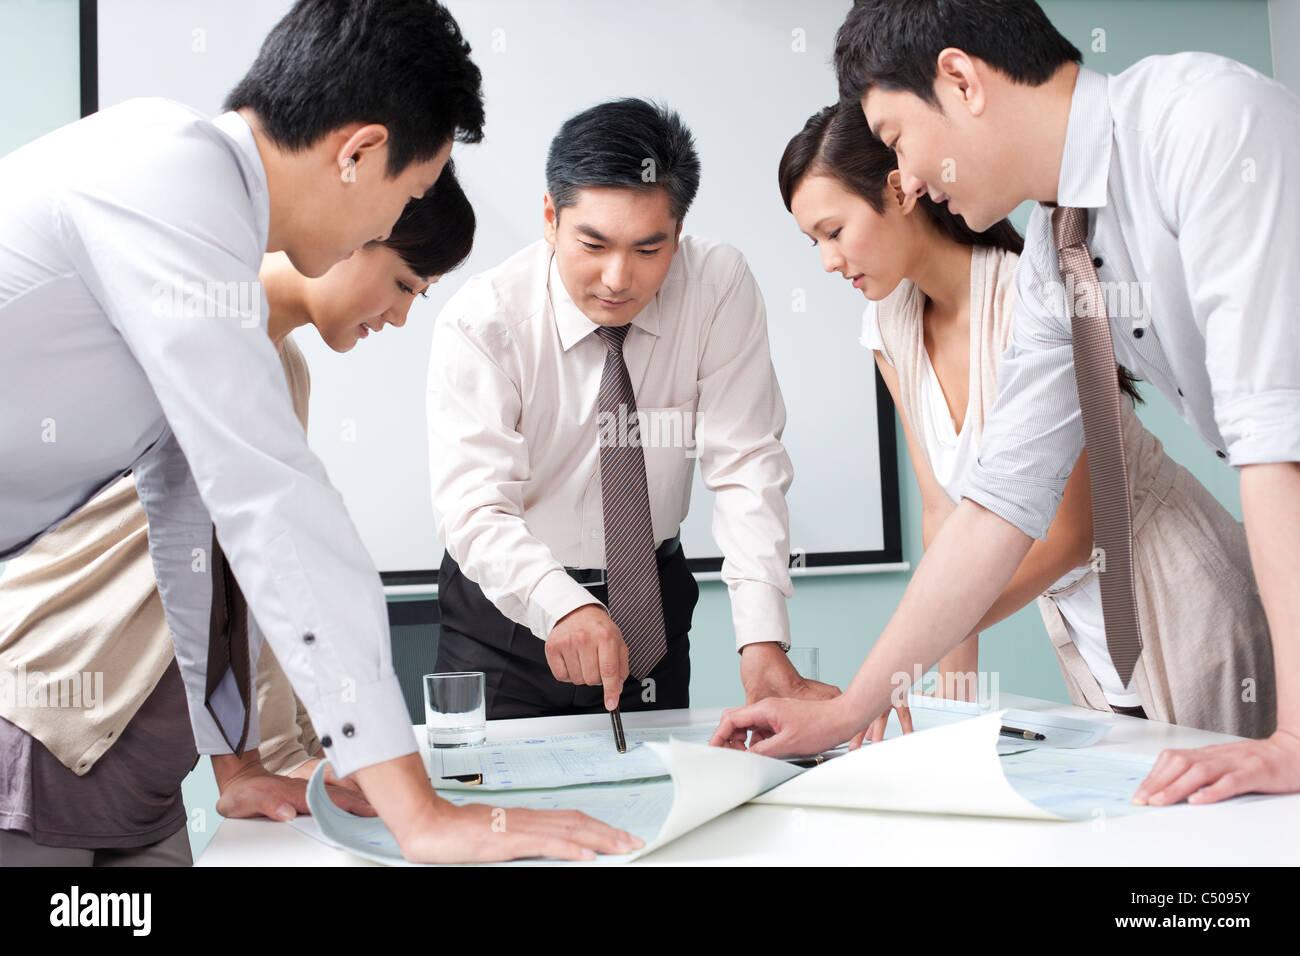 Business Executive Explaining Business Plan to Business Team - Stock Image